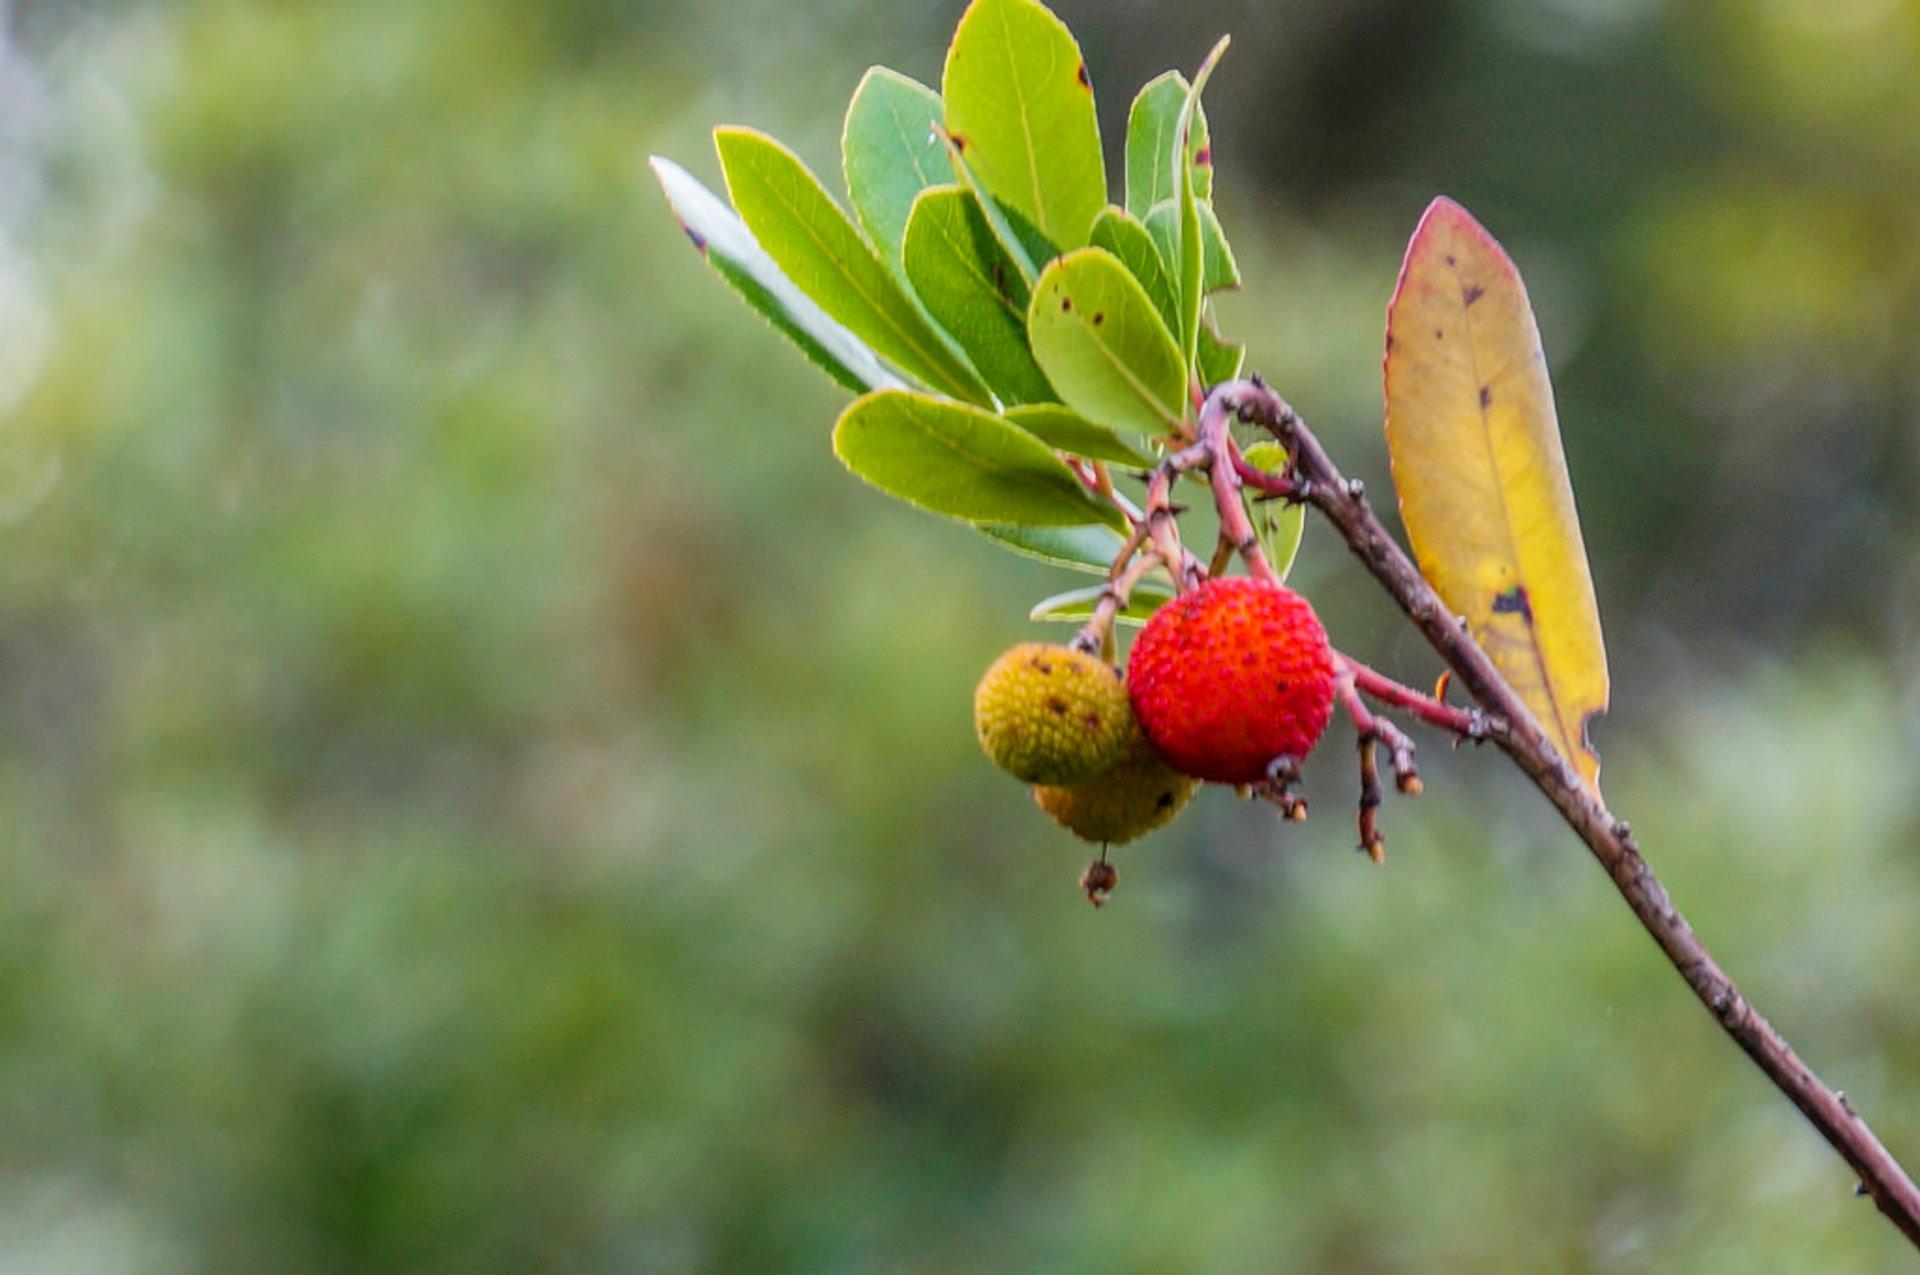 Wild Strawberries (Koca Yemiş) in Turkey 2020 - Best Time